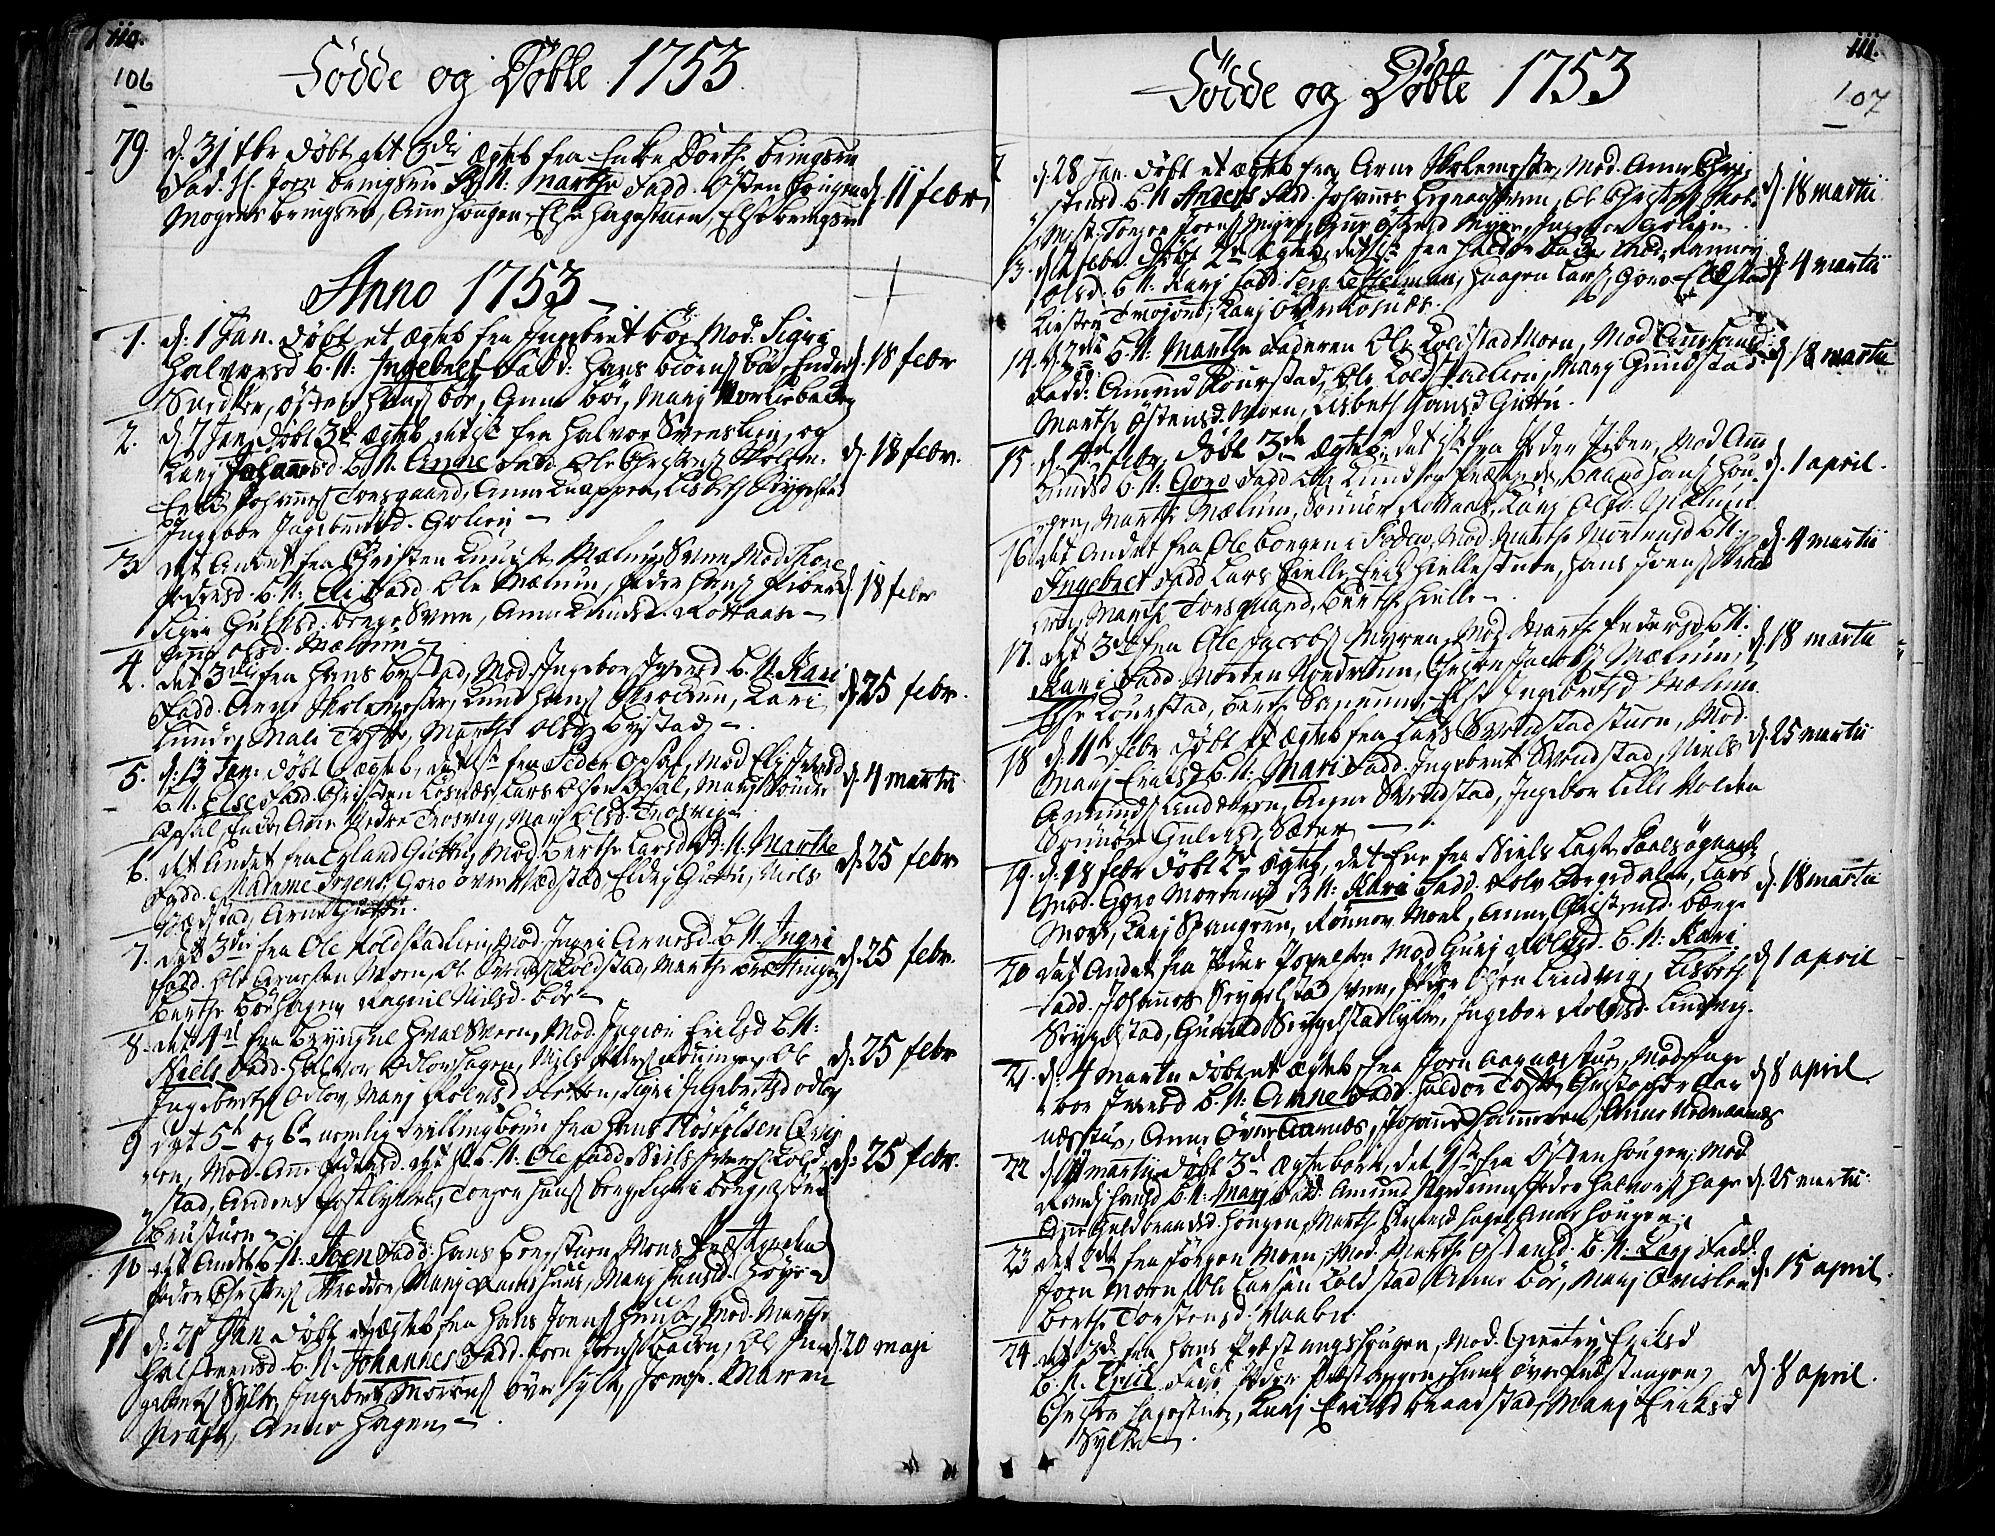 SAH, Ringebu prestekontor, Ministerialbok nr. 2, 1734-1780, s. 106-107